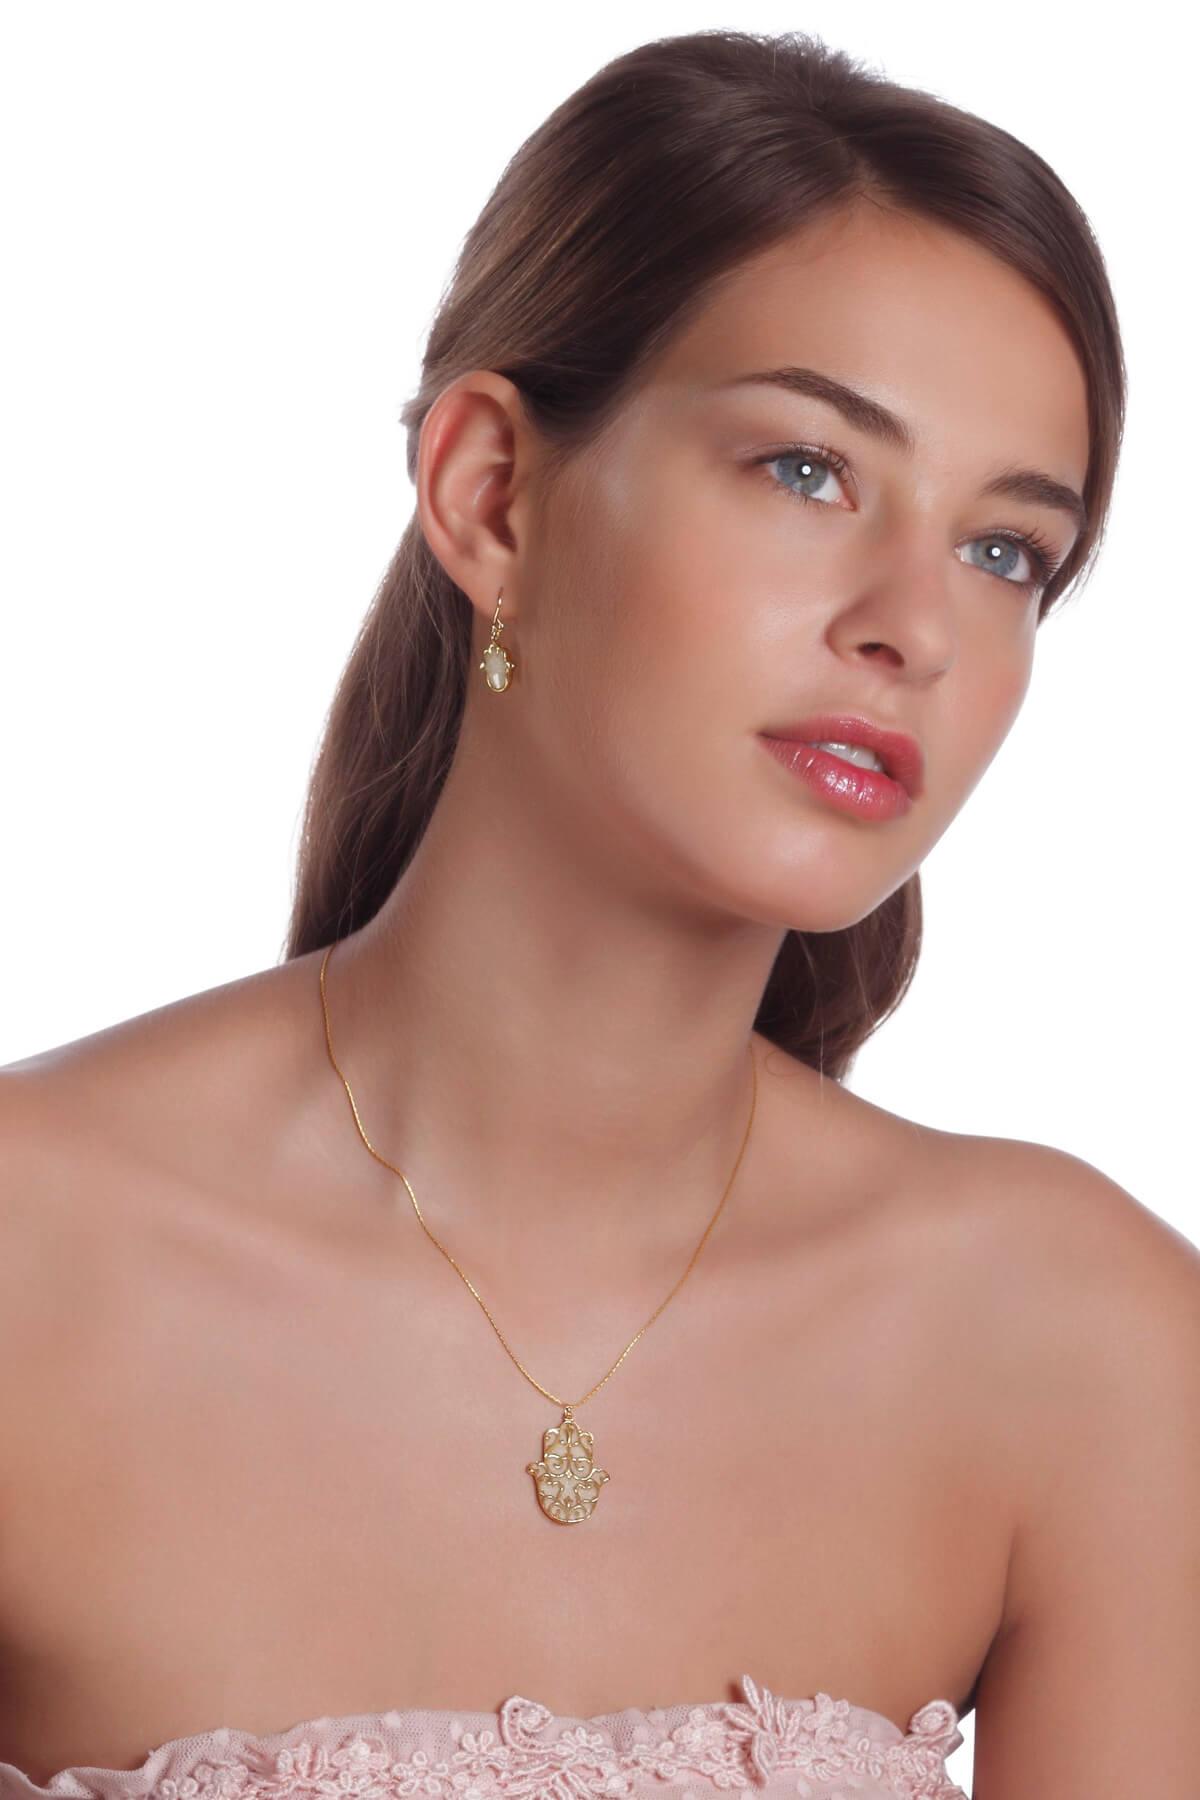 Handmade Vermeil Hamsa Necklace and earrings  – Pearl Pattern